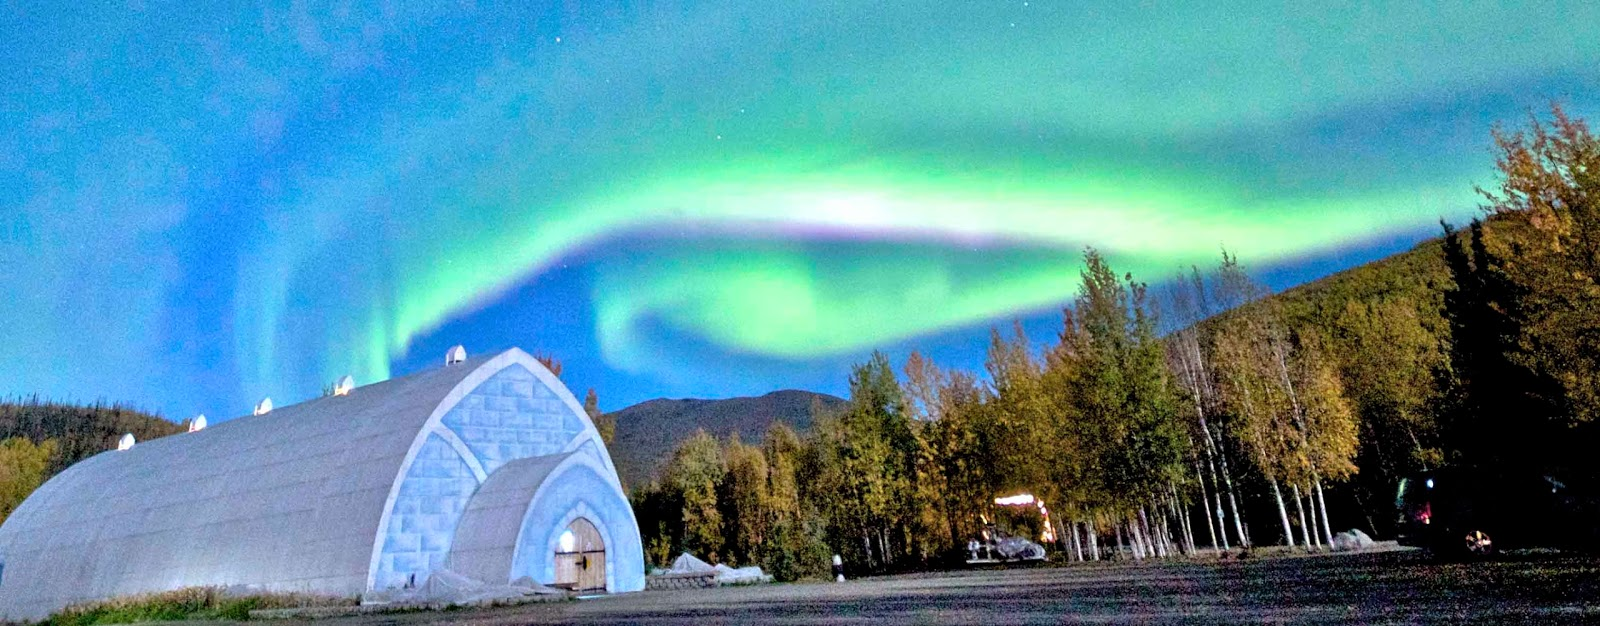 Chena Hot Springs / Aurora Ice Museum, Alaska- Top 10 Coolest Snow Buildings